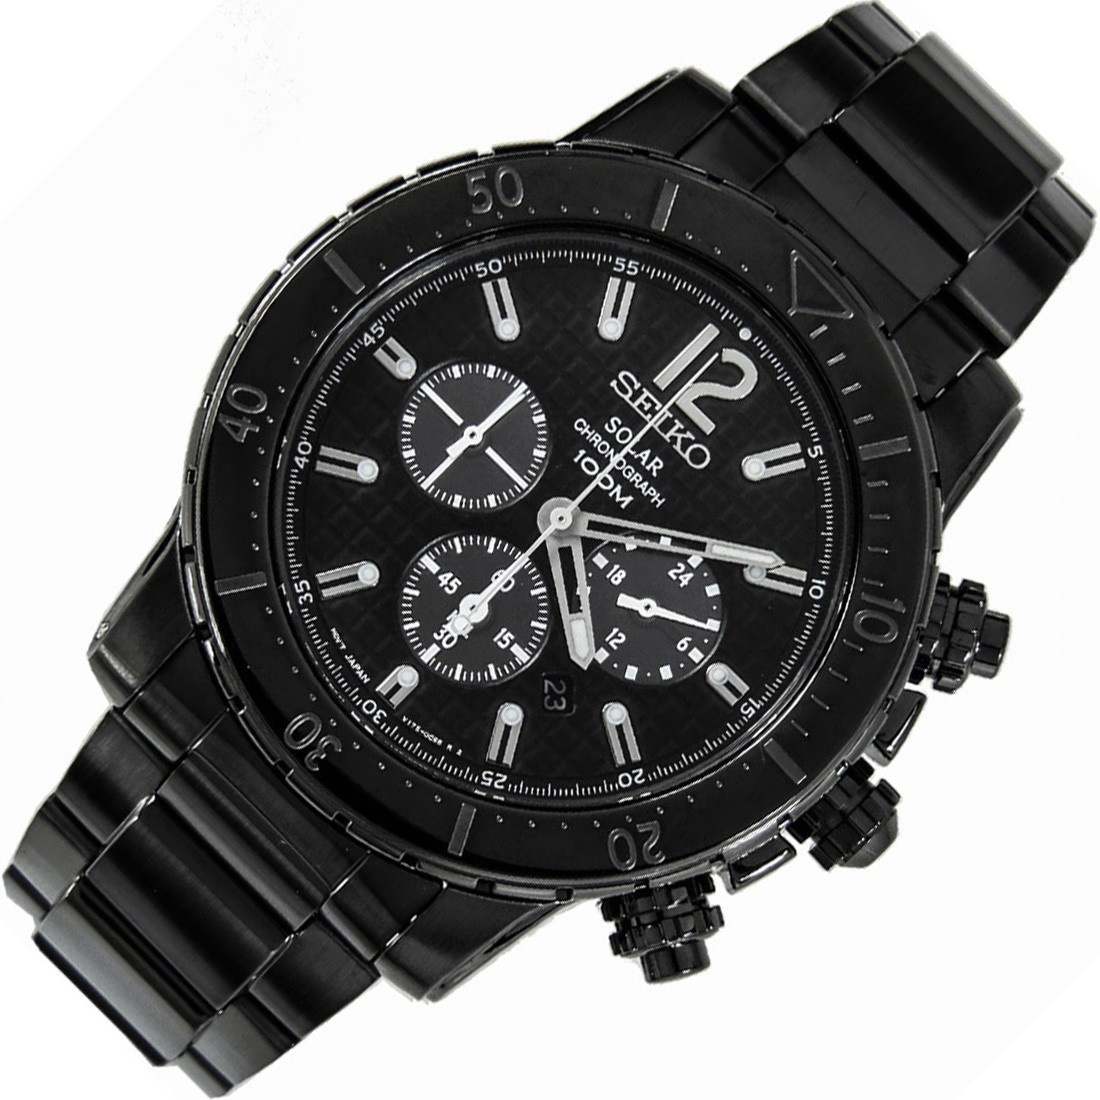 Часы Seiko SSC225P1 хронограф SOLAR